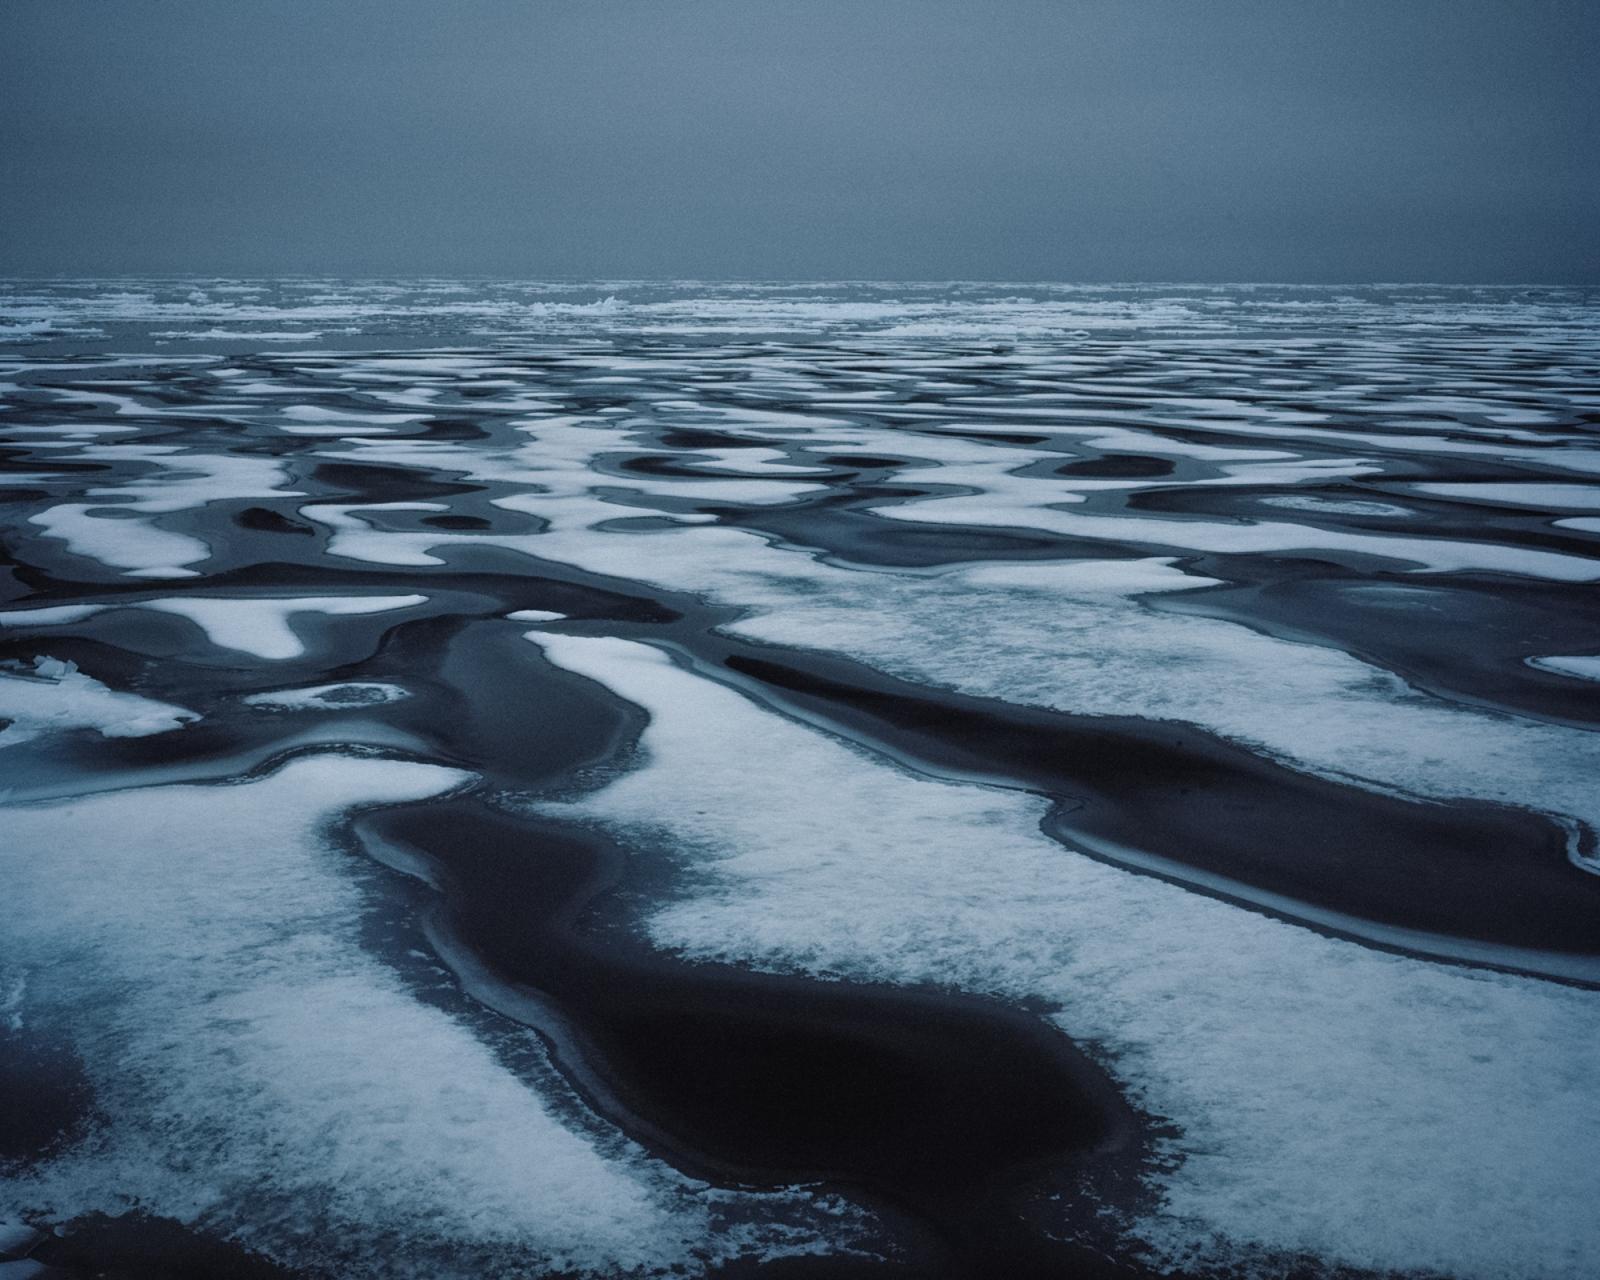 Sea ice near Resolute, Nunavut. Canada, 2014.